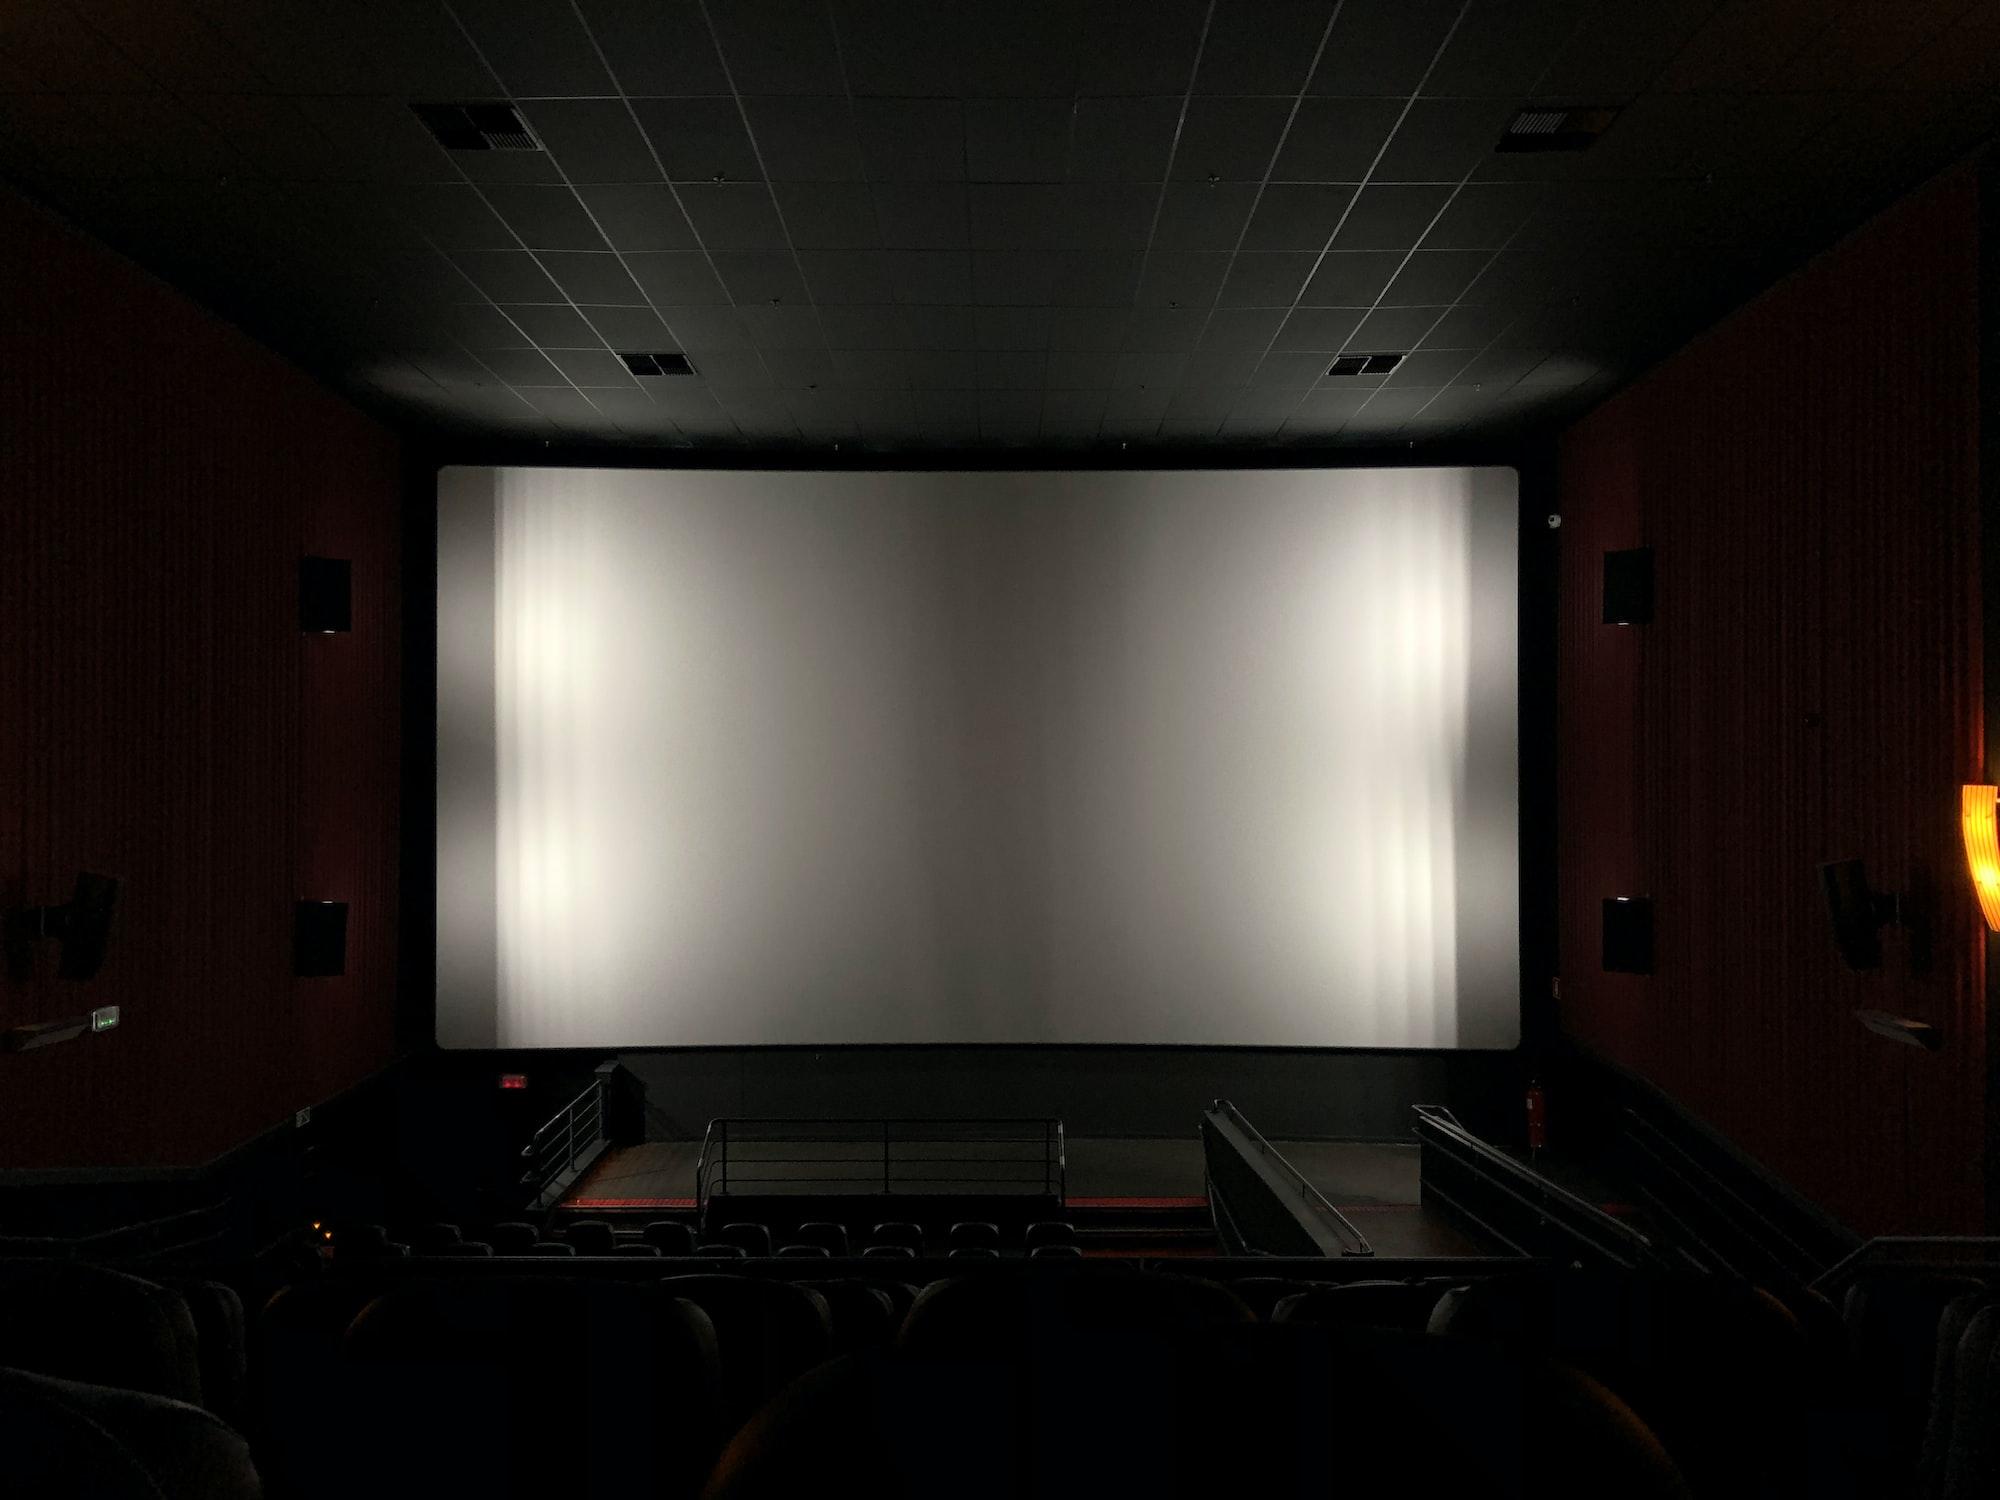 Notes on Cinema